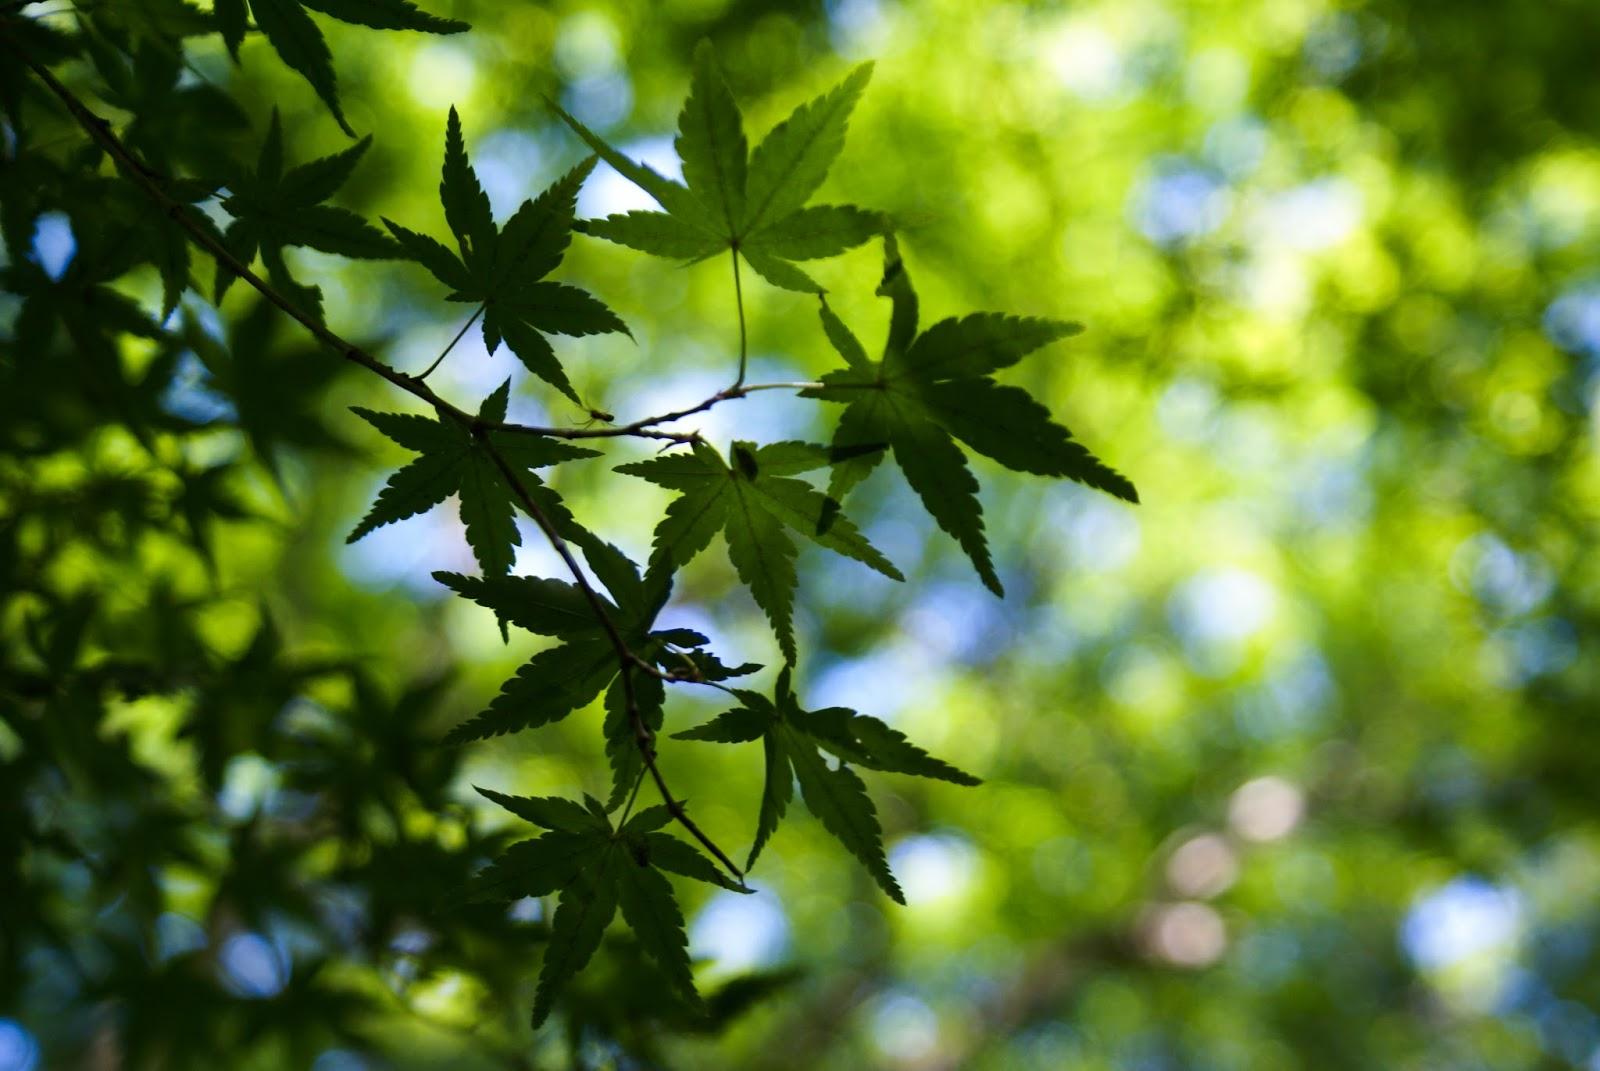 arashiyama kyoto japan gioji zen maple leaf spring